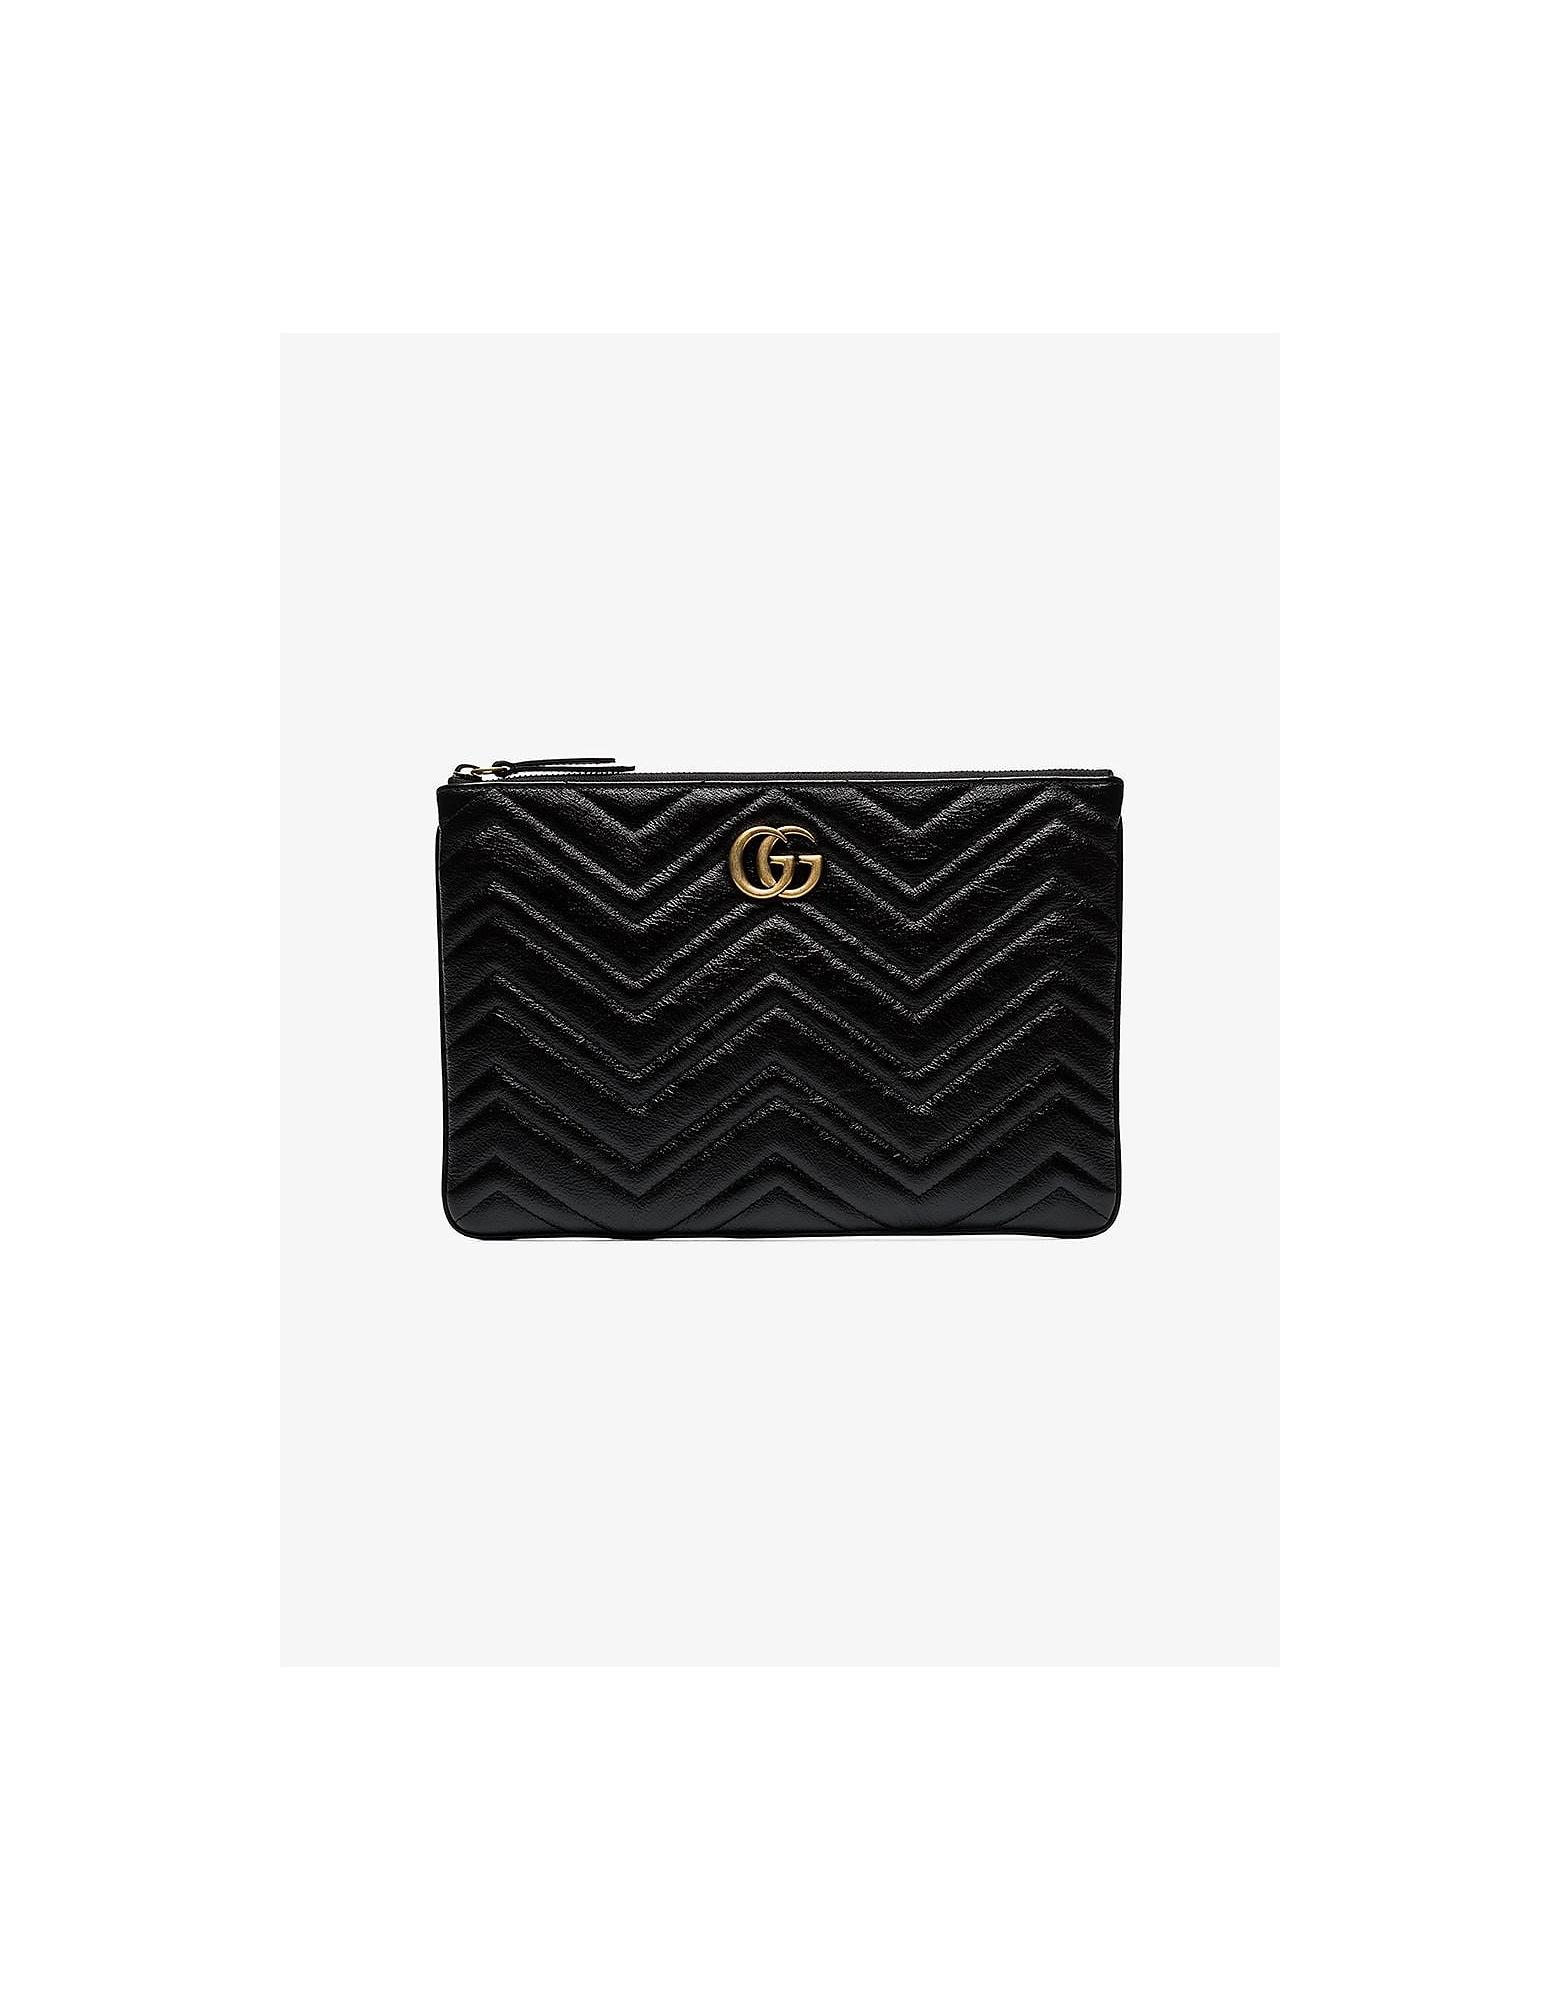 Gucci Designer Handbags, GG Marmont clutch